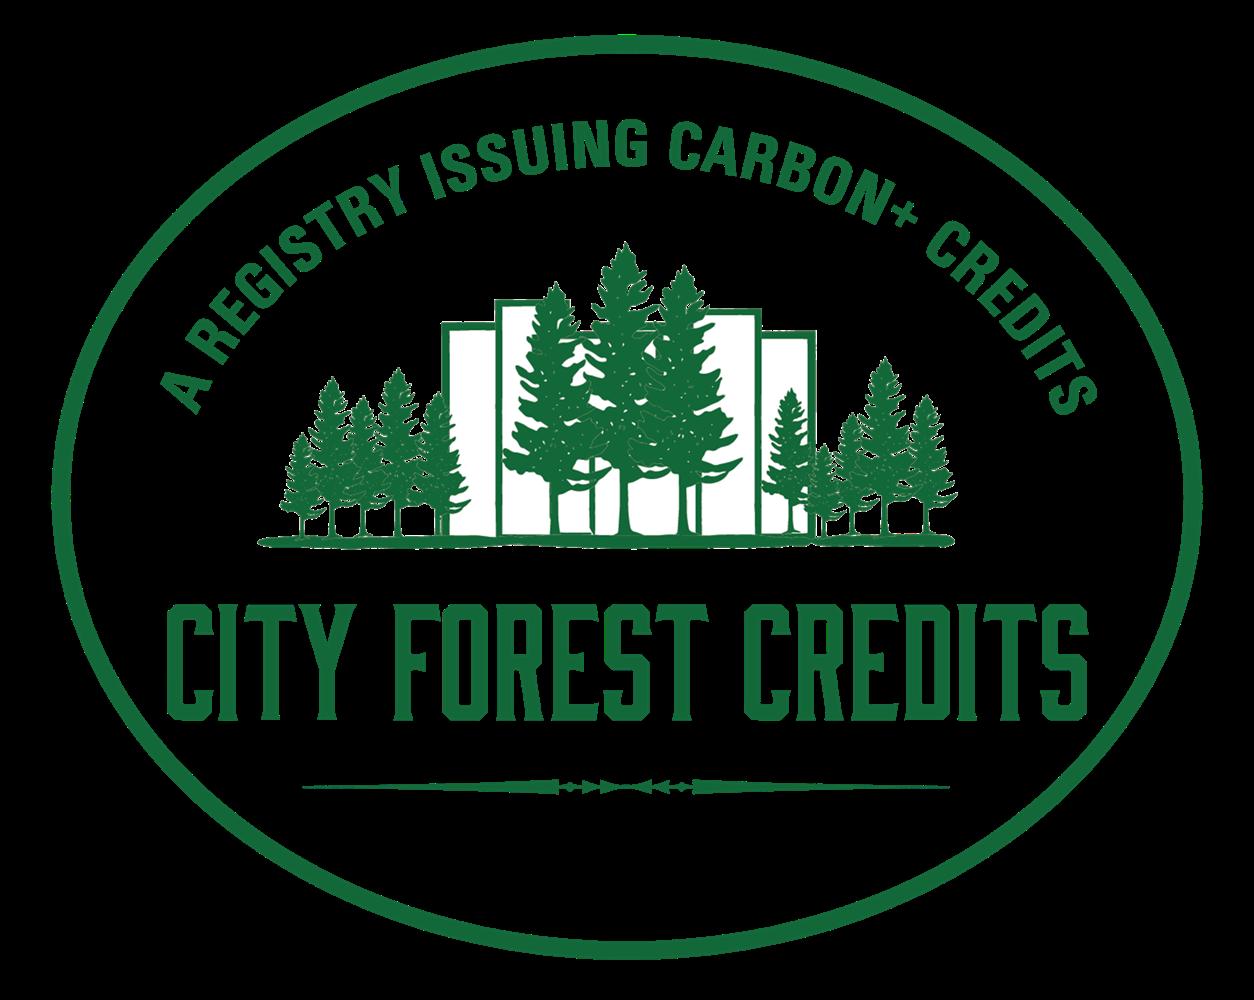 CityForestCredits_logo.png